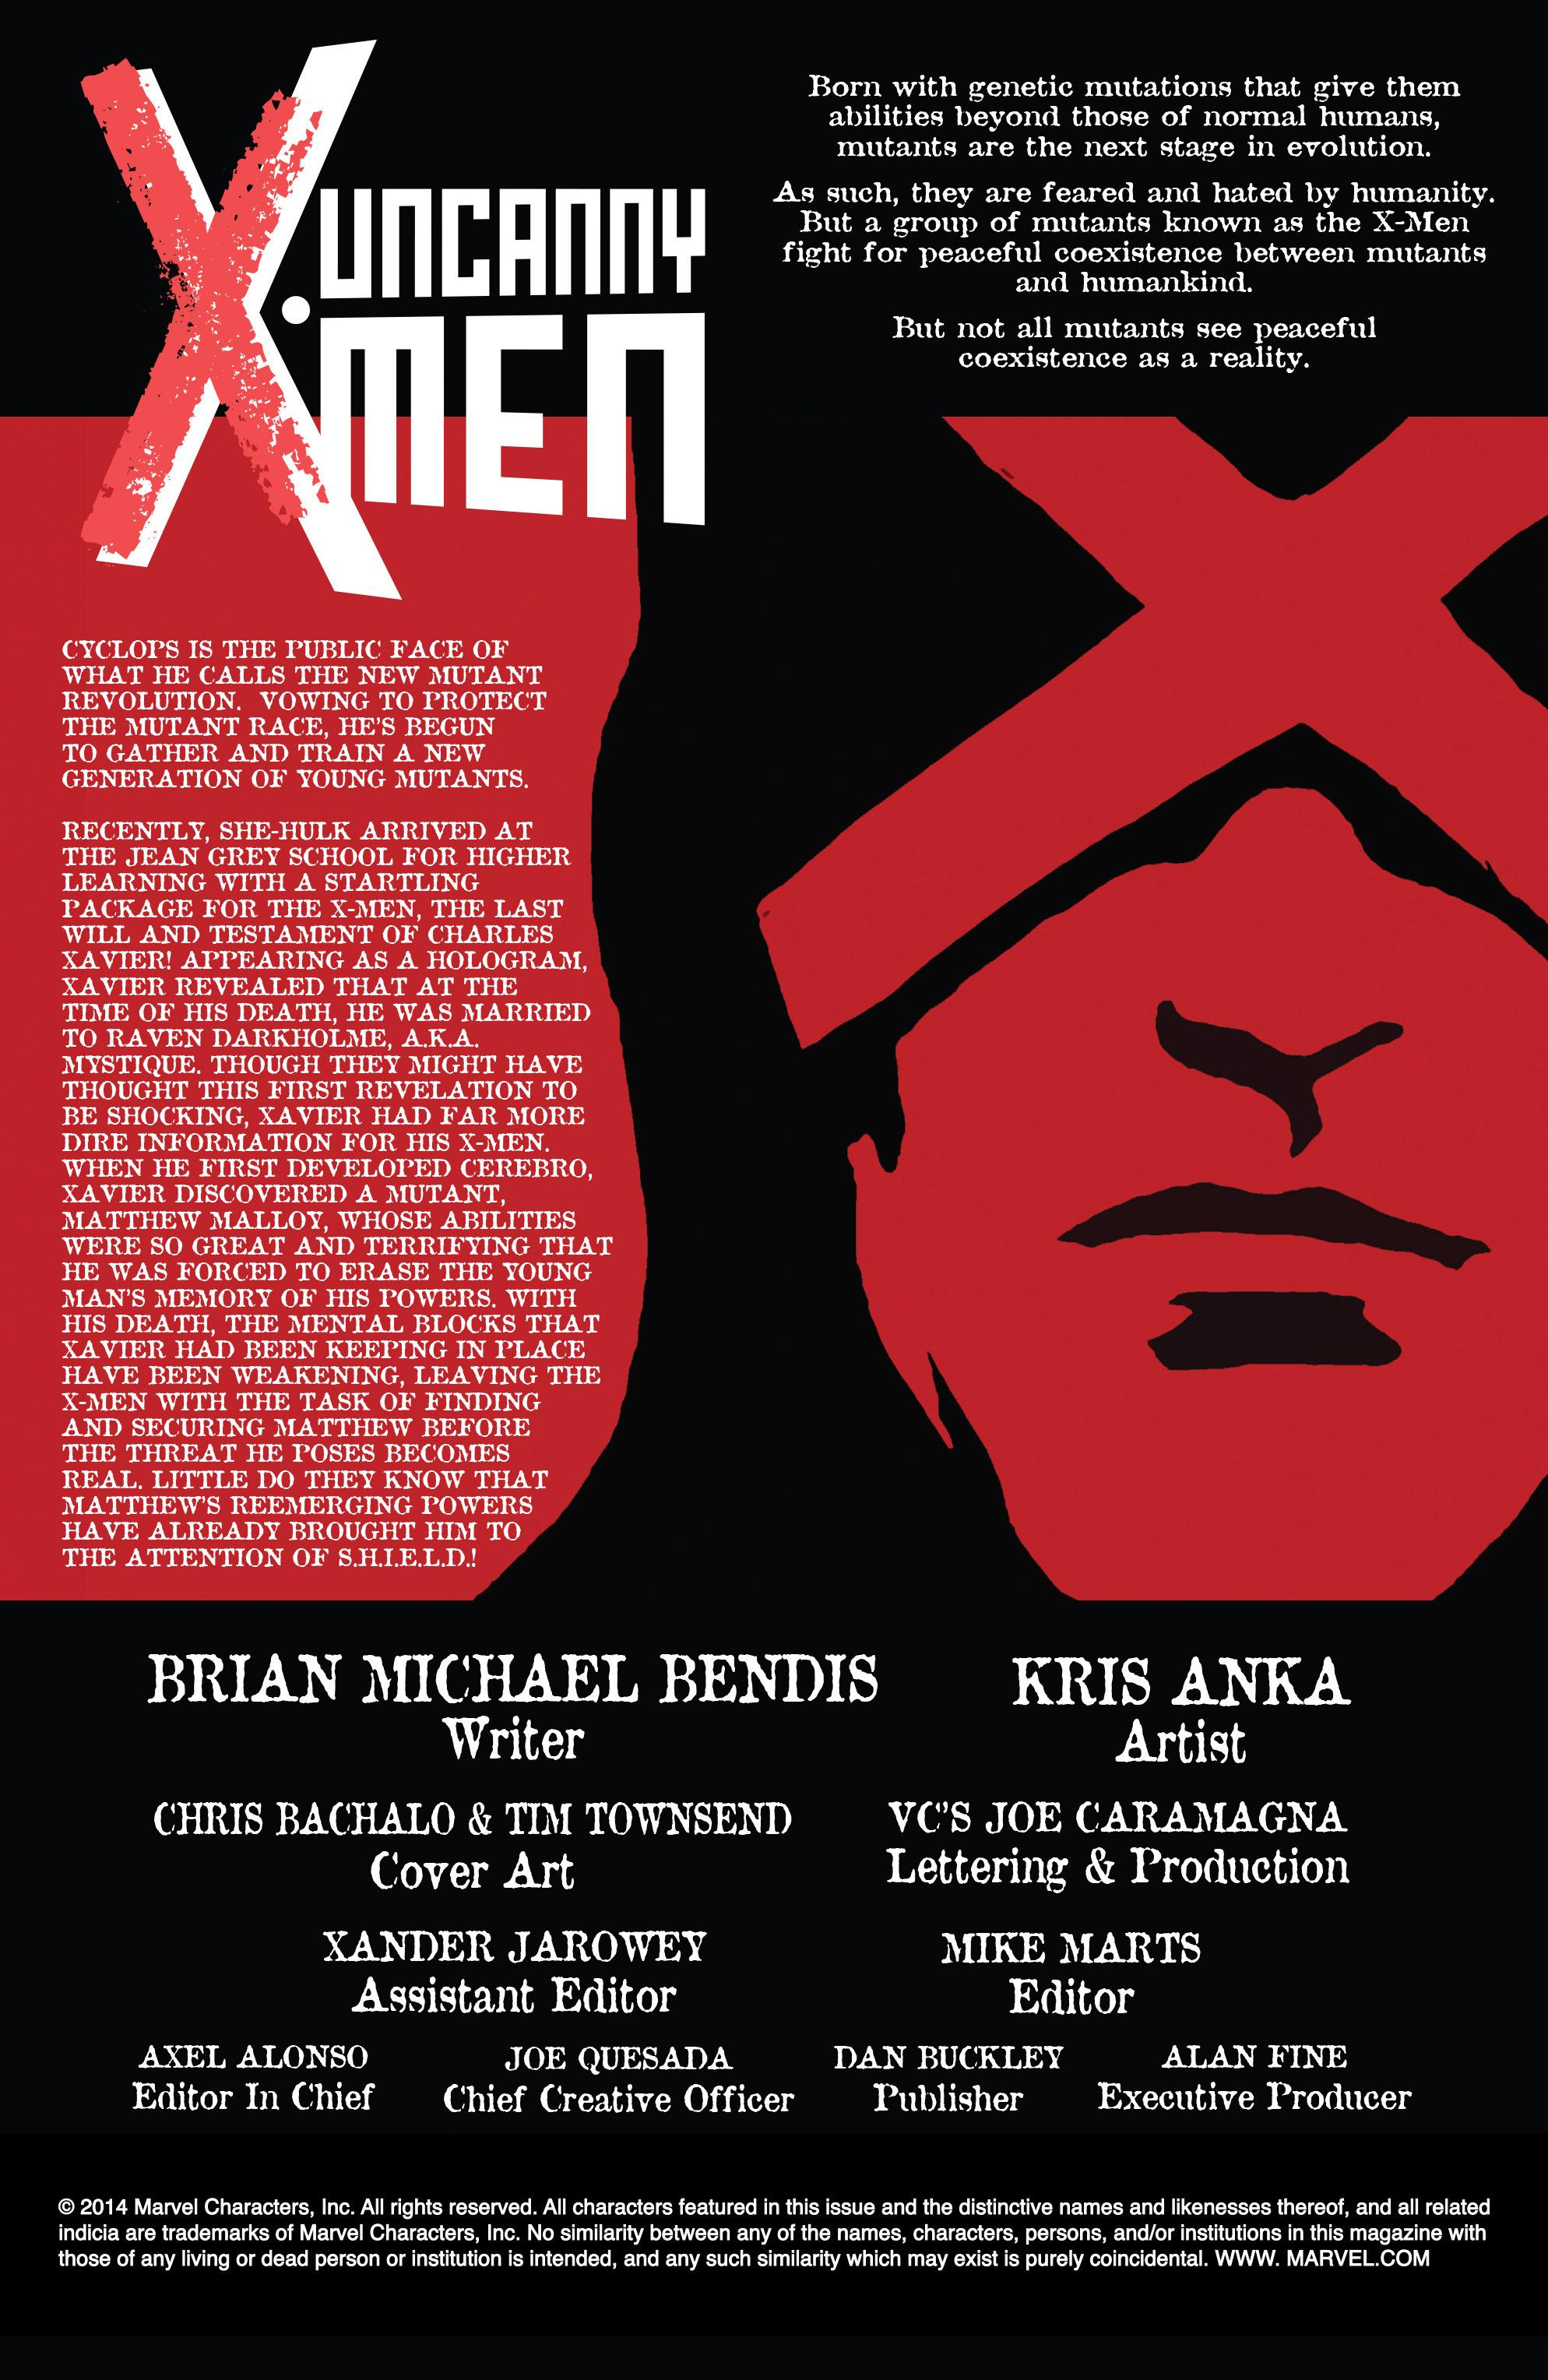 Read online Uncanny X-Men (2013) comic -  Issue # _TPB 5 - The Omega Mutant - 4